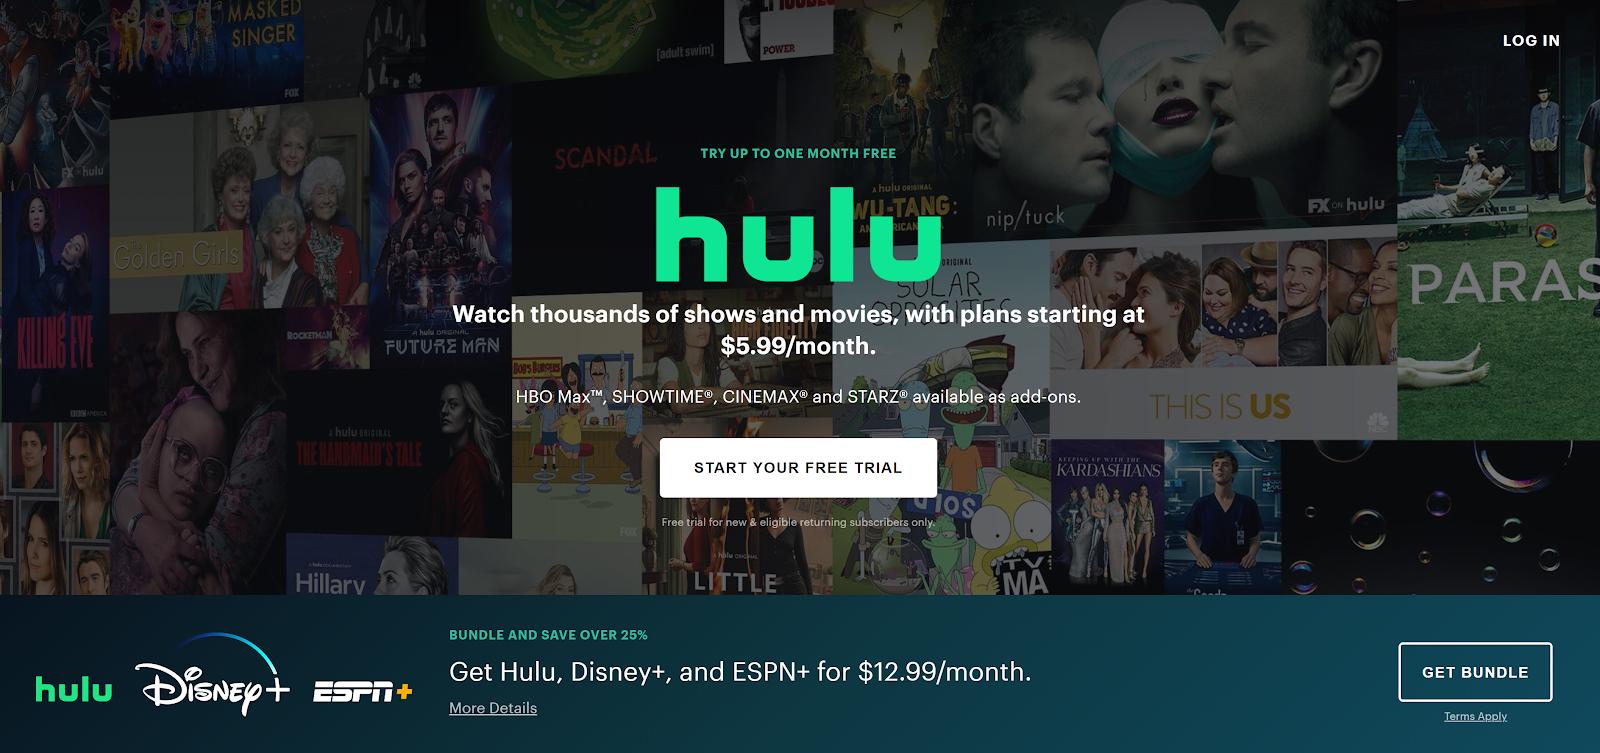 HD/4K Streaming and P2P File Sharing